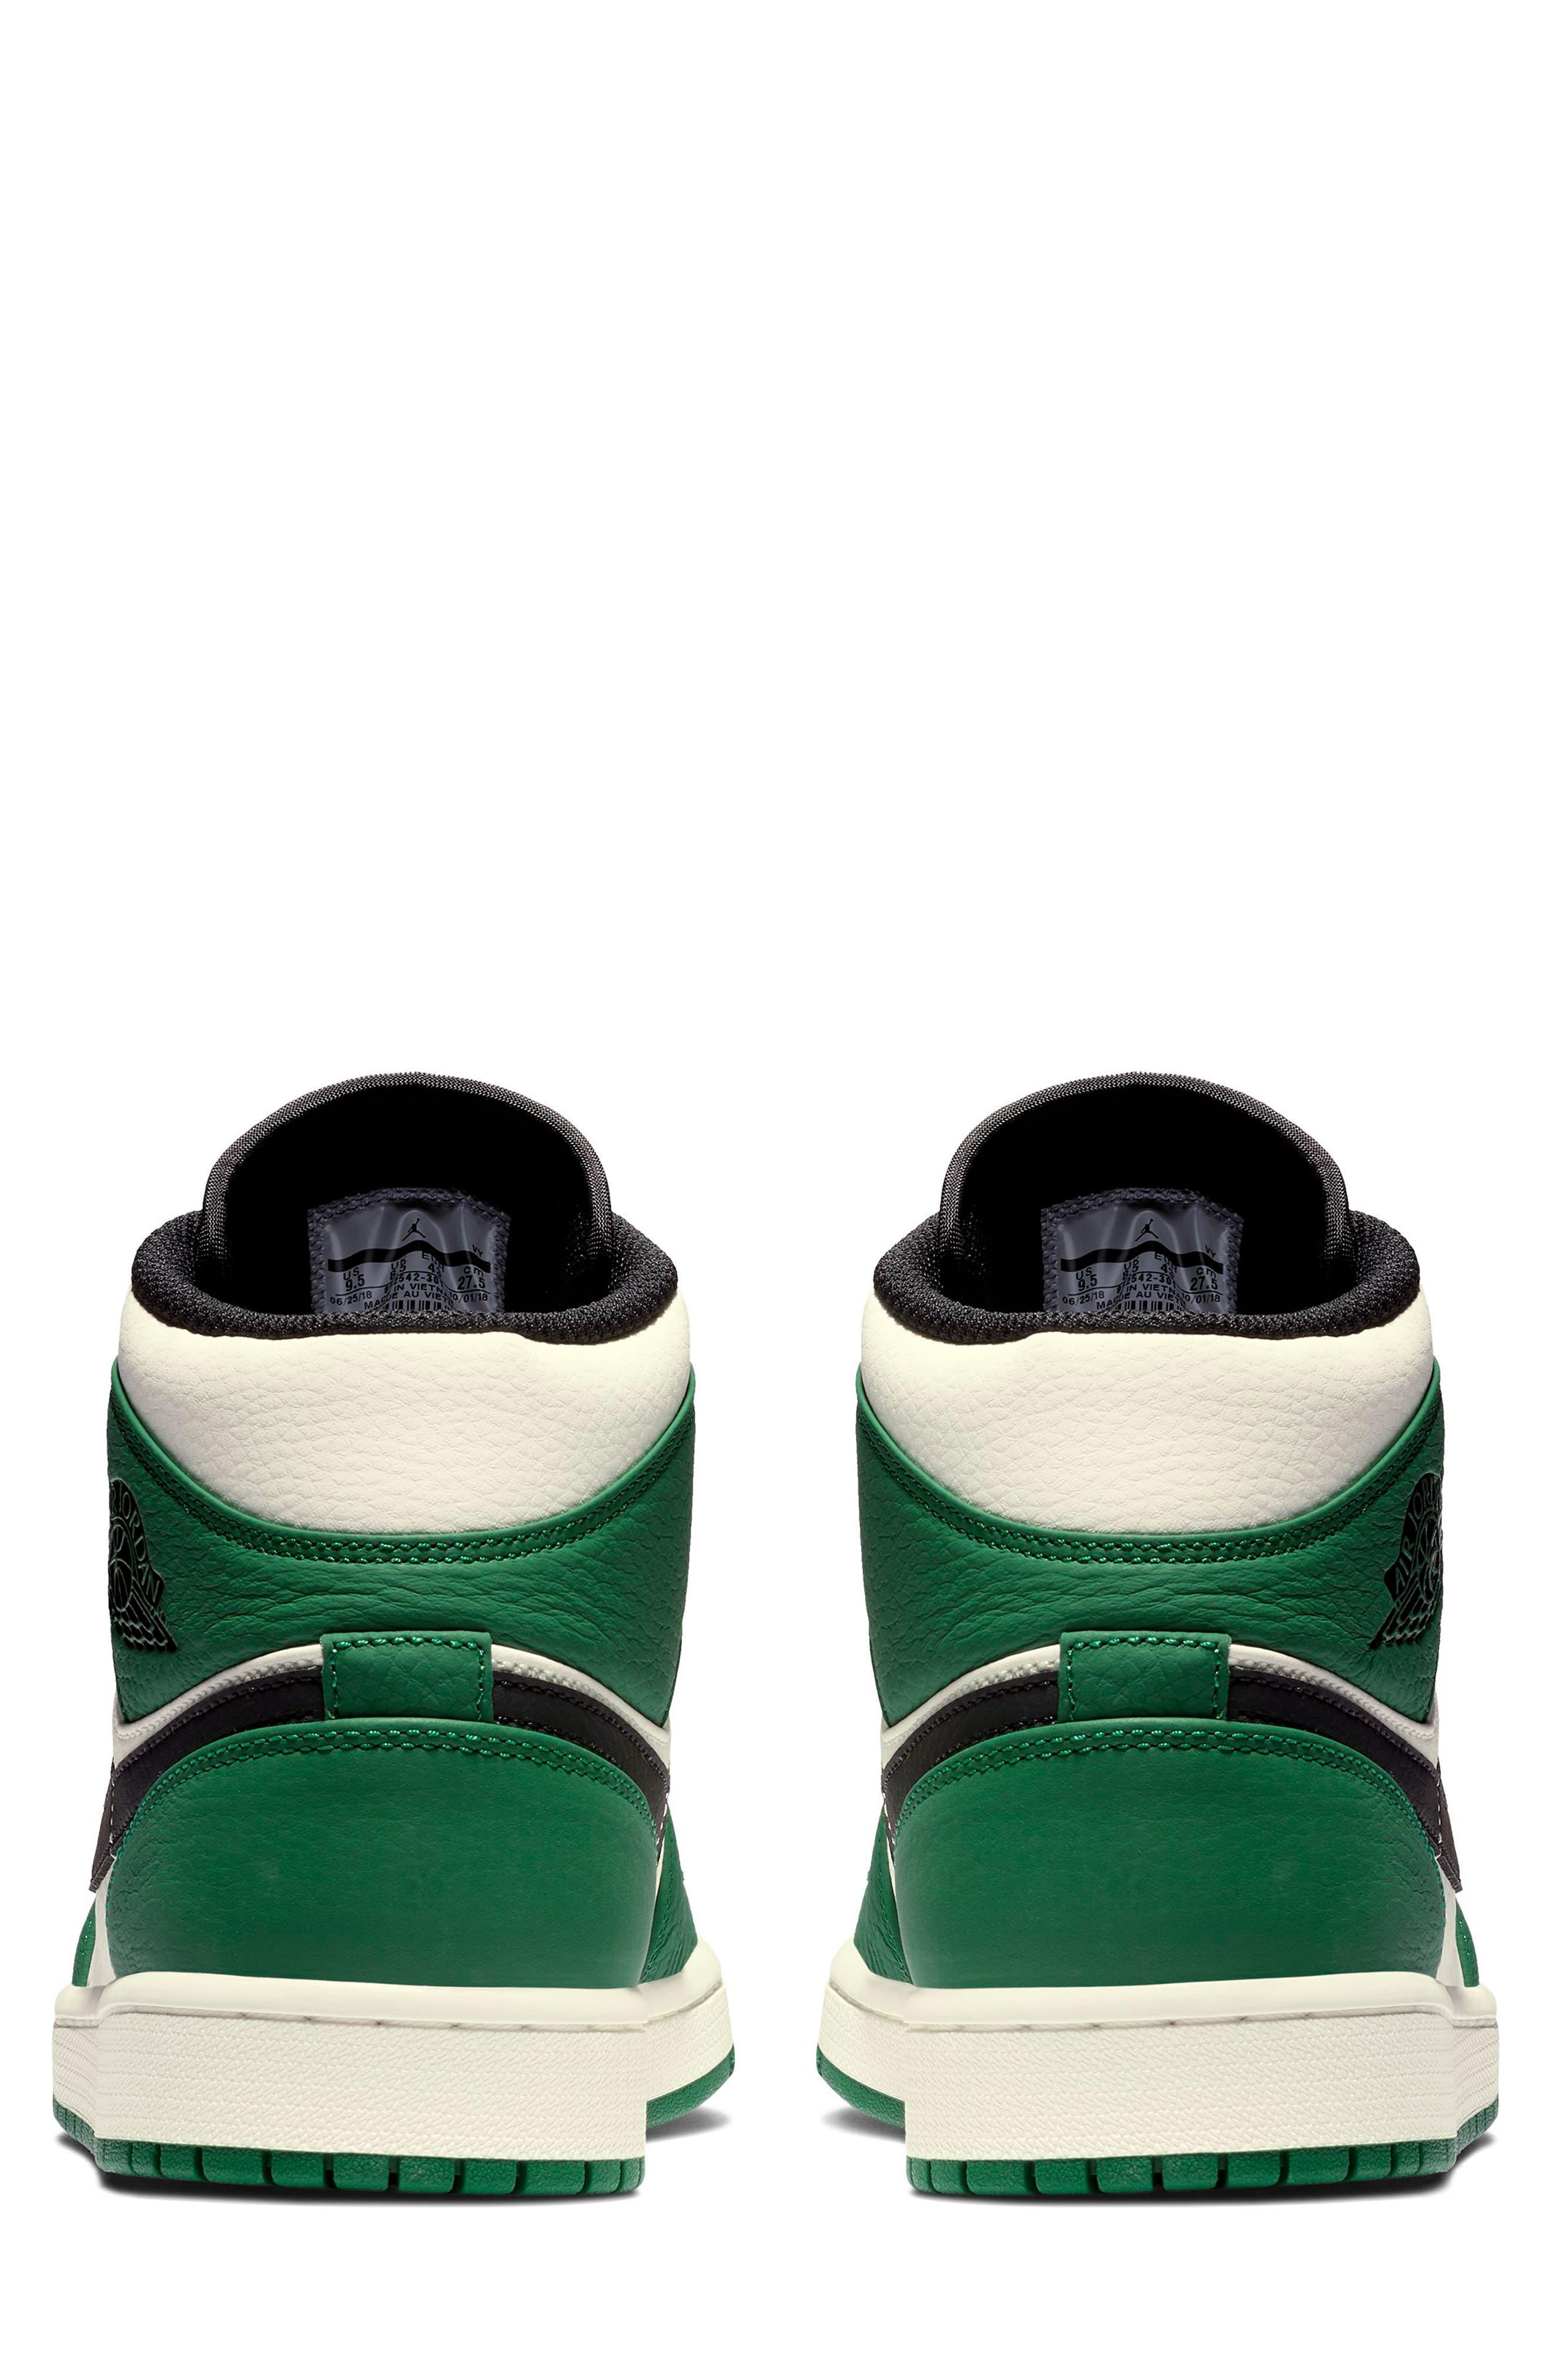 NIKE, Air Jordan 1 Mid Winterized Sneaker, Alternate thumbnail 5, color, 301